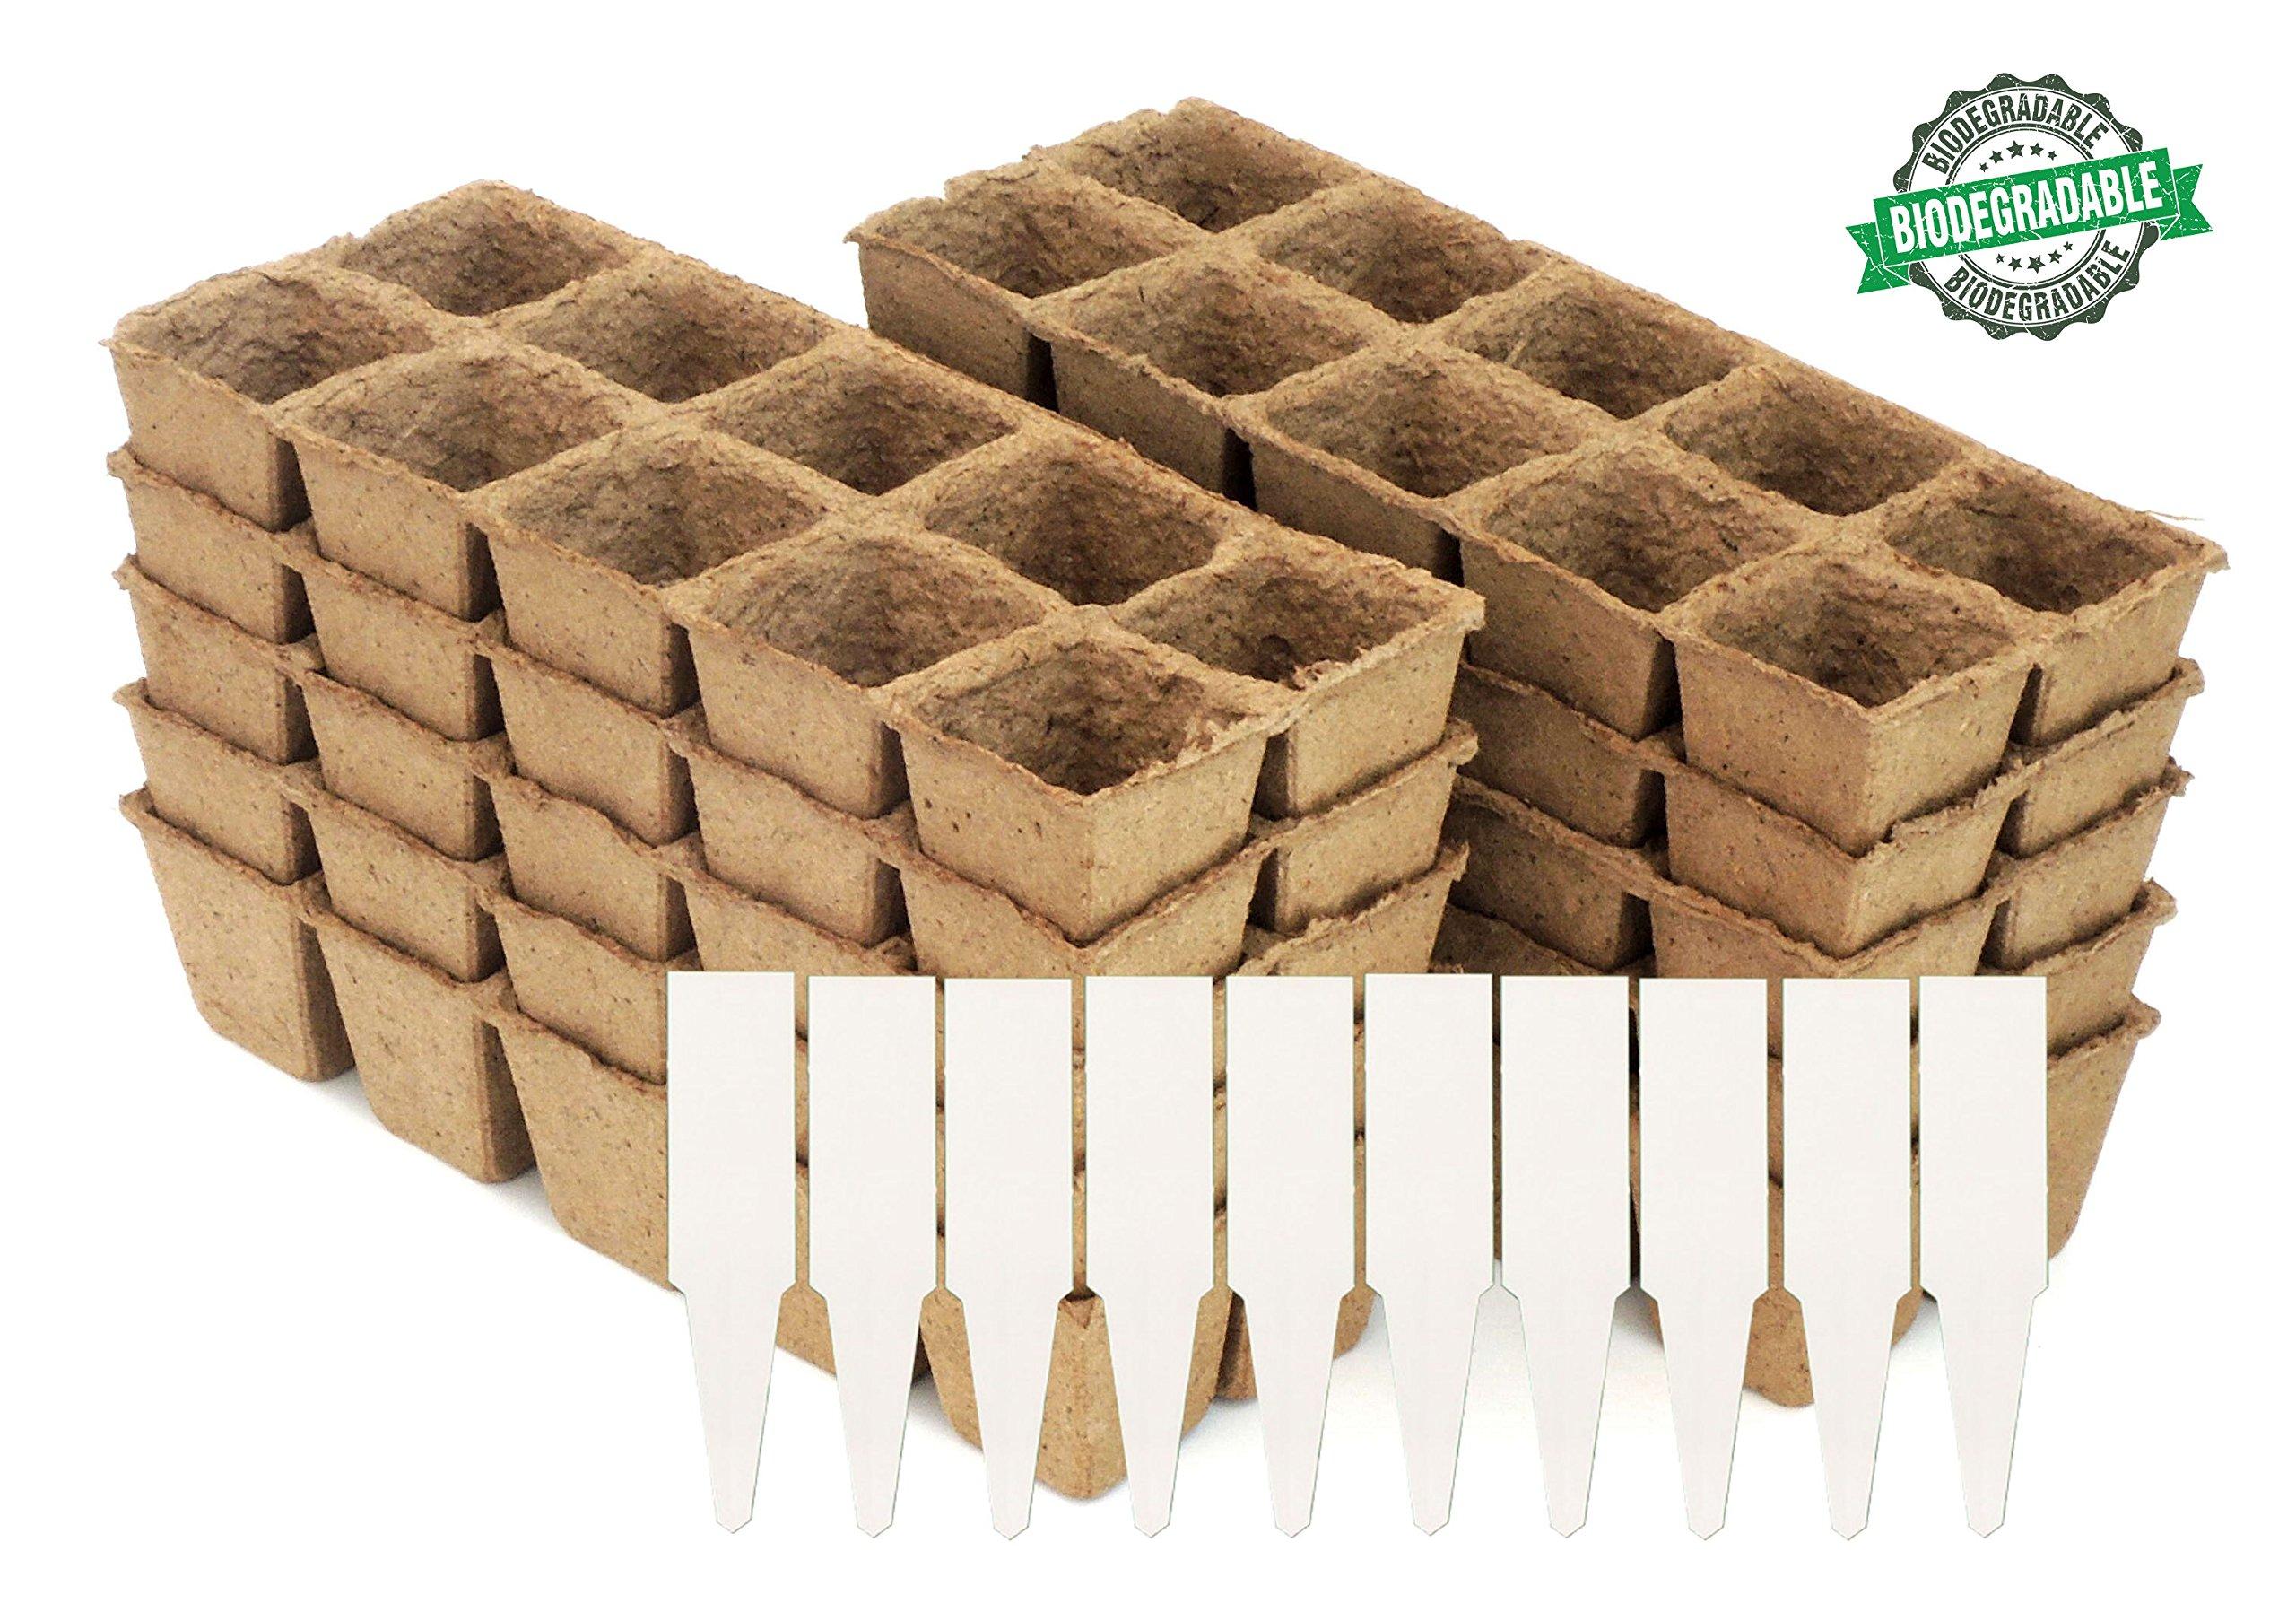 Peat Pot Seedling Starter Trays   Seed Germination Kit - Organic Biodegradable Pots 100% Eco-Friendly Enhance Aeration   BONUS 10 Plastic Plant Markers - 100 Cell Pack